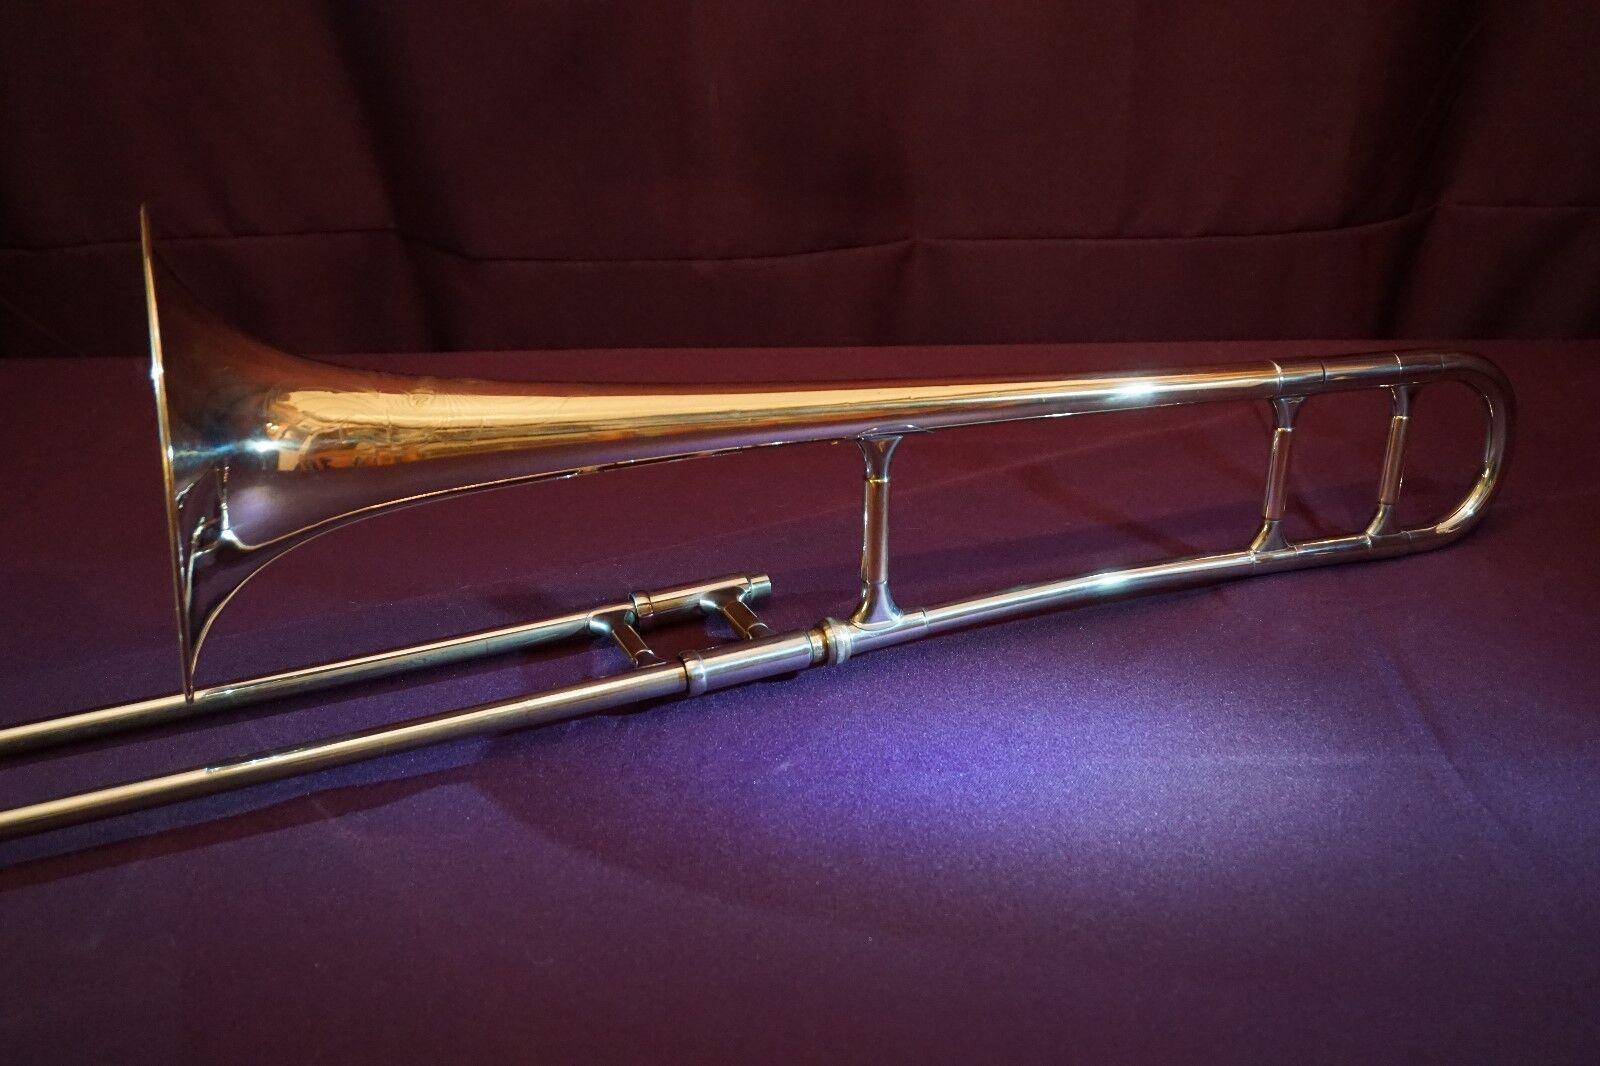 1959 FE Olds R-15 Professionelles Tenor Trombone-Fullerton Kalif